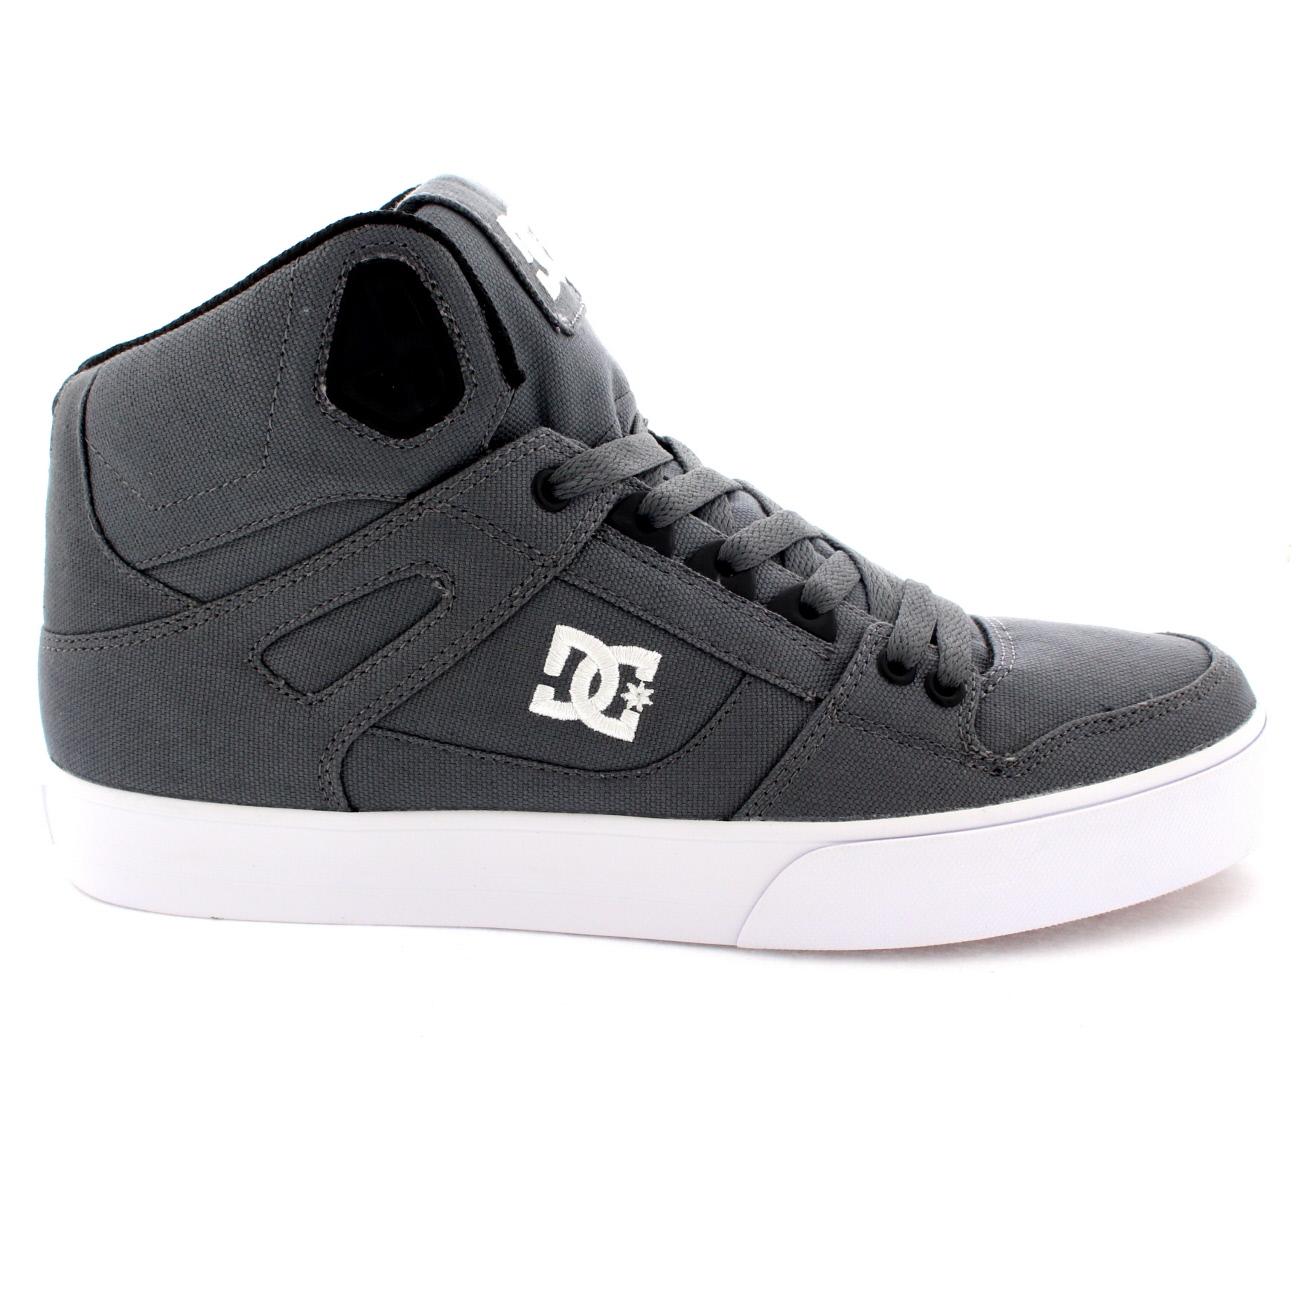 Dc Mens High Top Skate Shoes